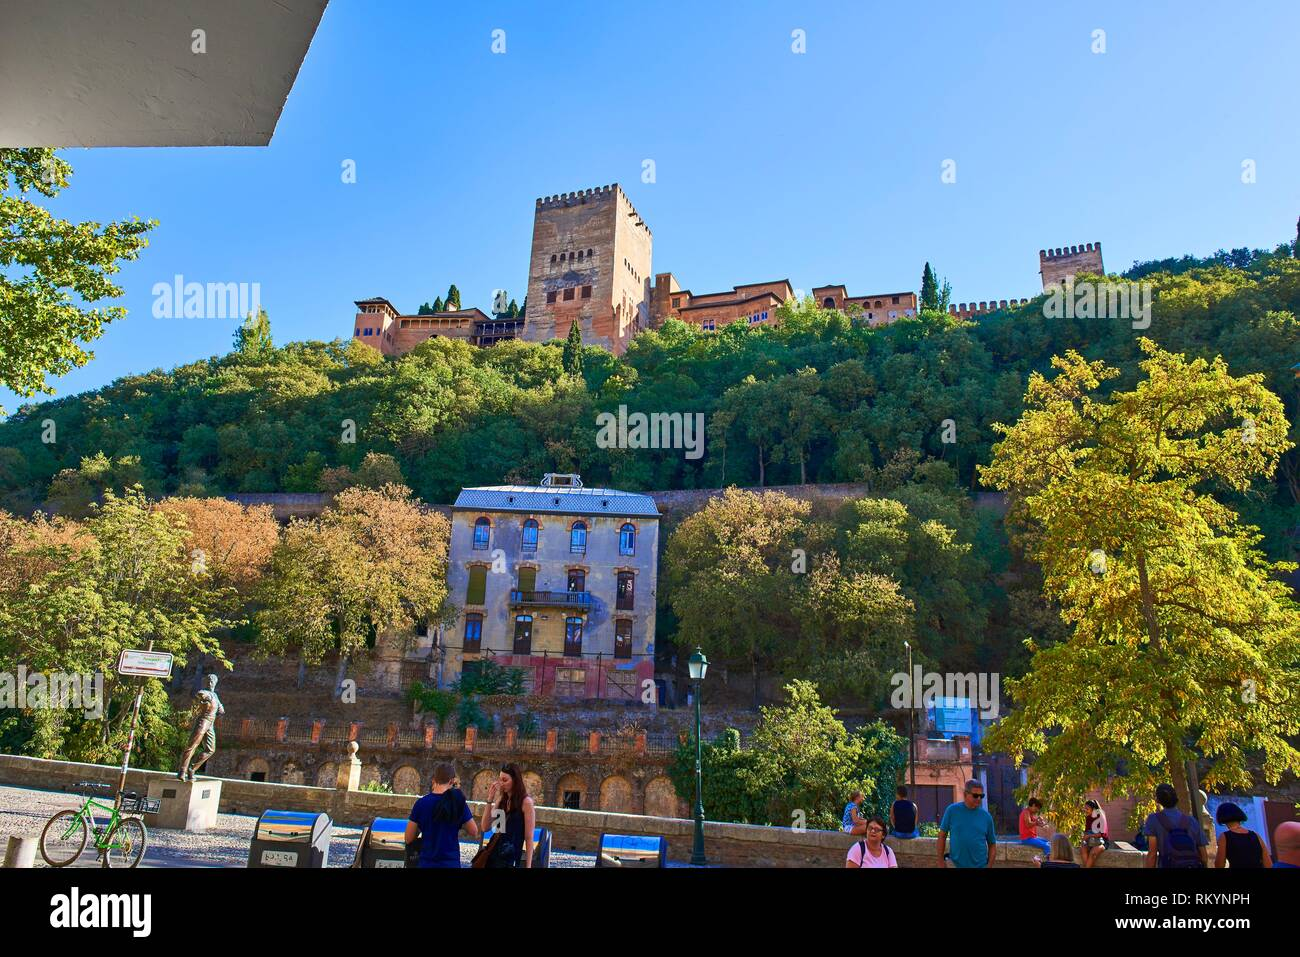 Alhambra, UNESCO World Heritage Site, Granada, Andalusia, Spain. - Stock Image